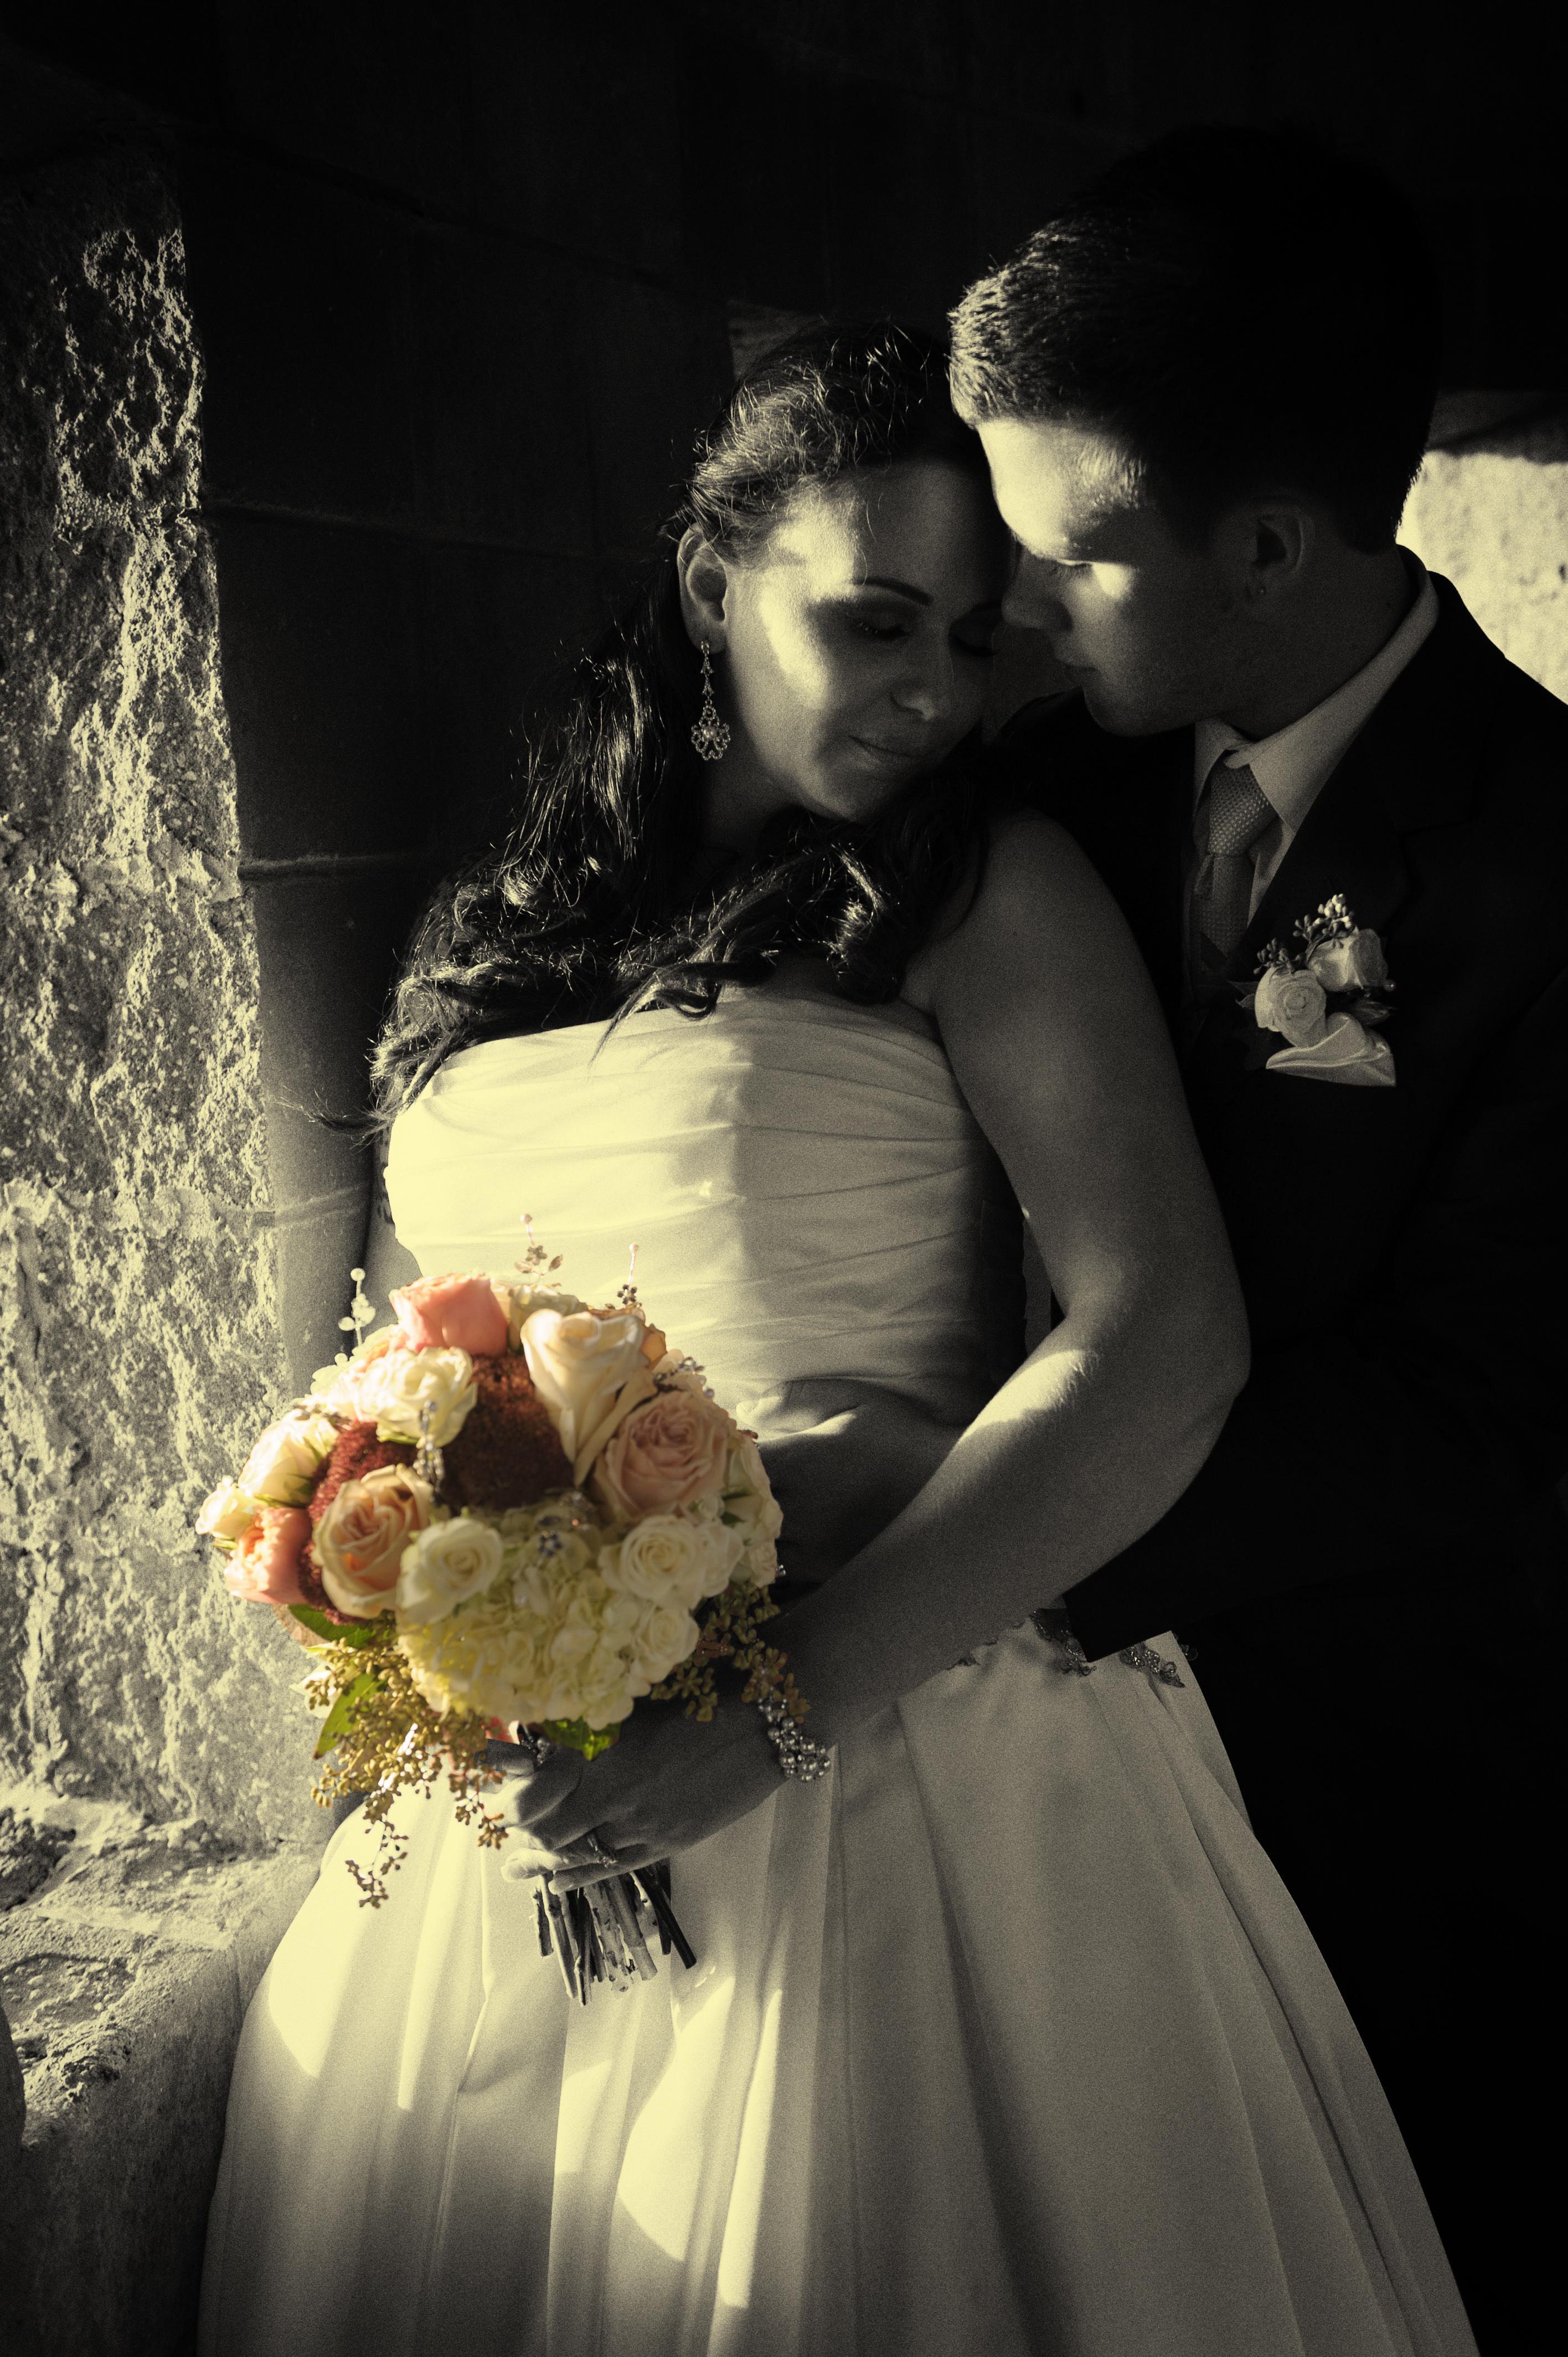 Couple wedding photography St Paul (1)